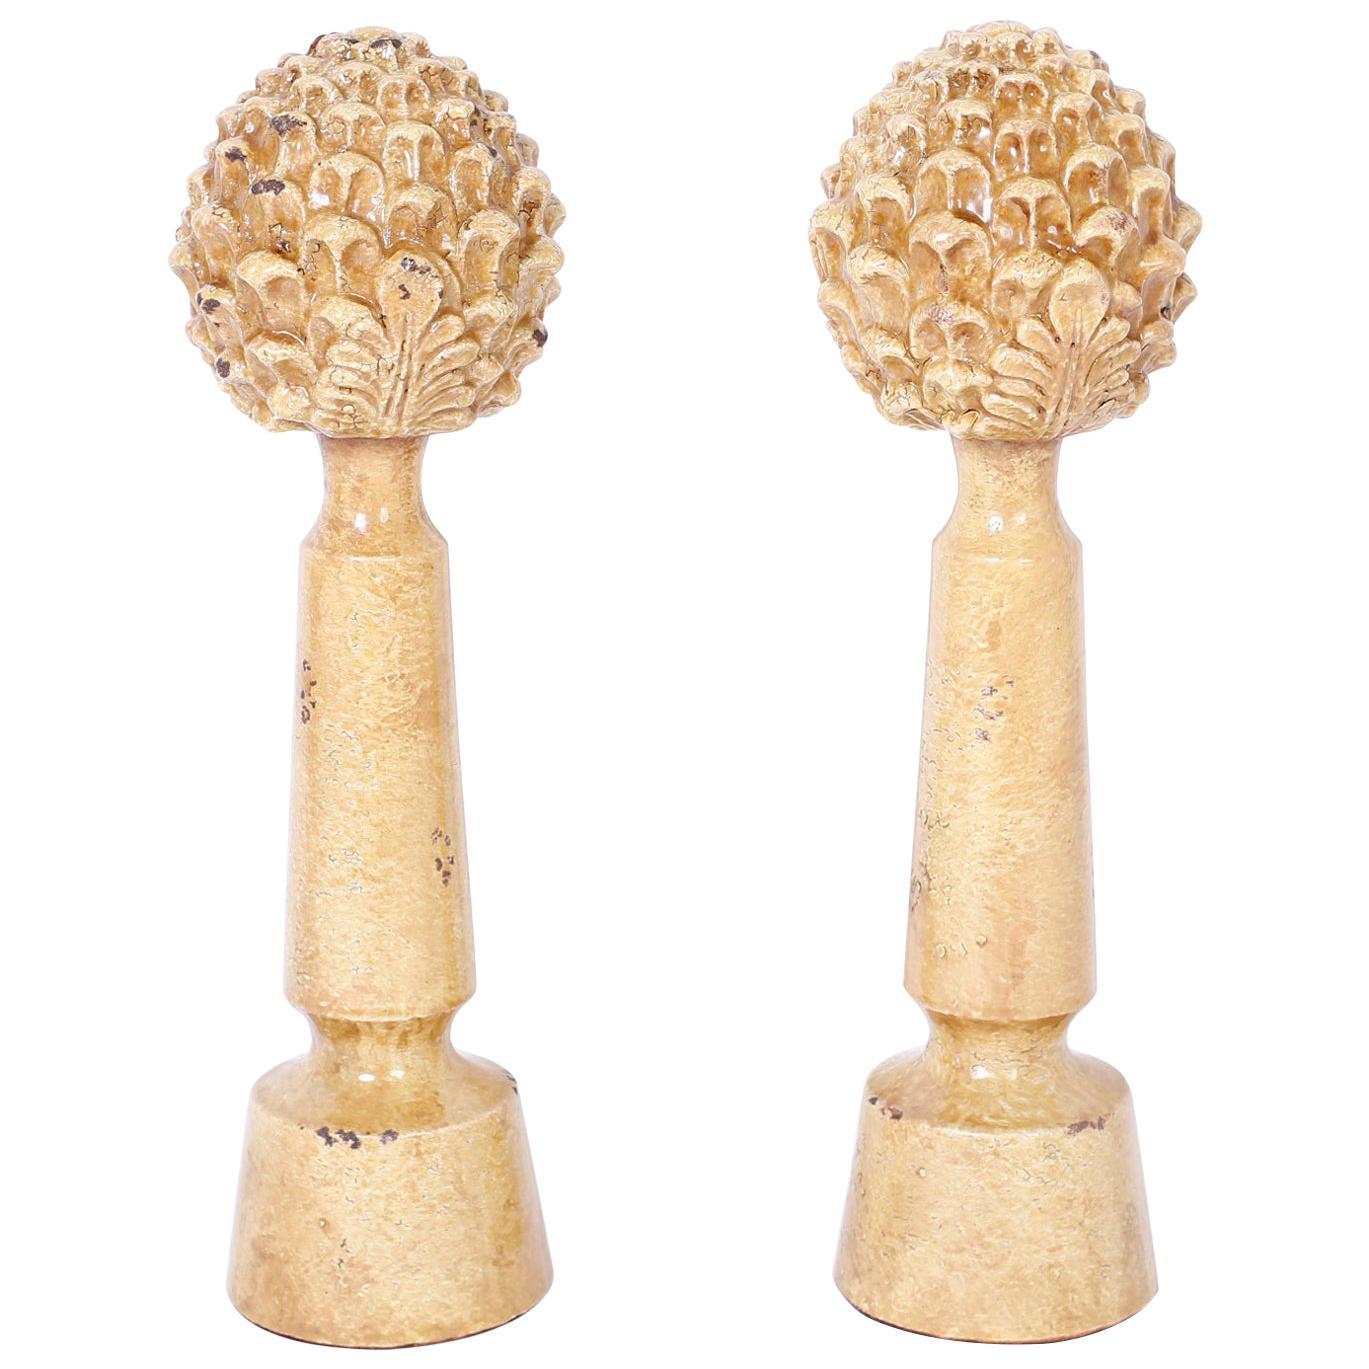 Pair of Terracotta Artichoke Garnitures